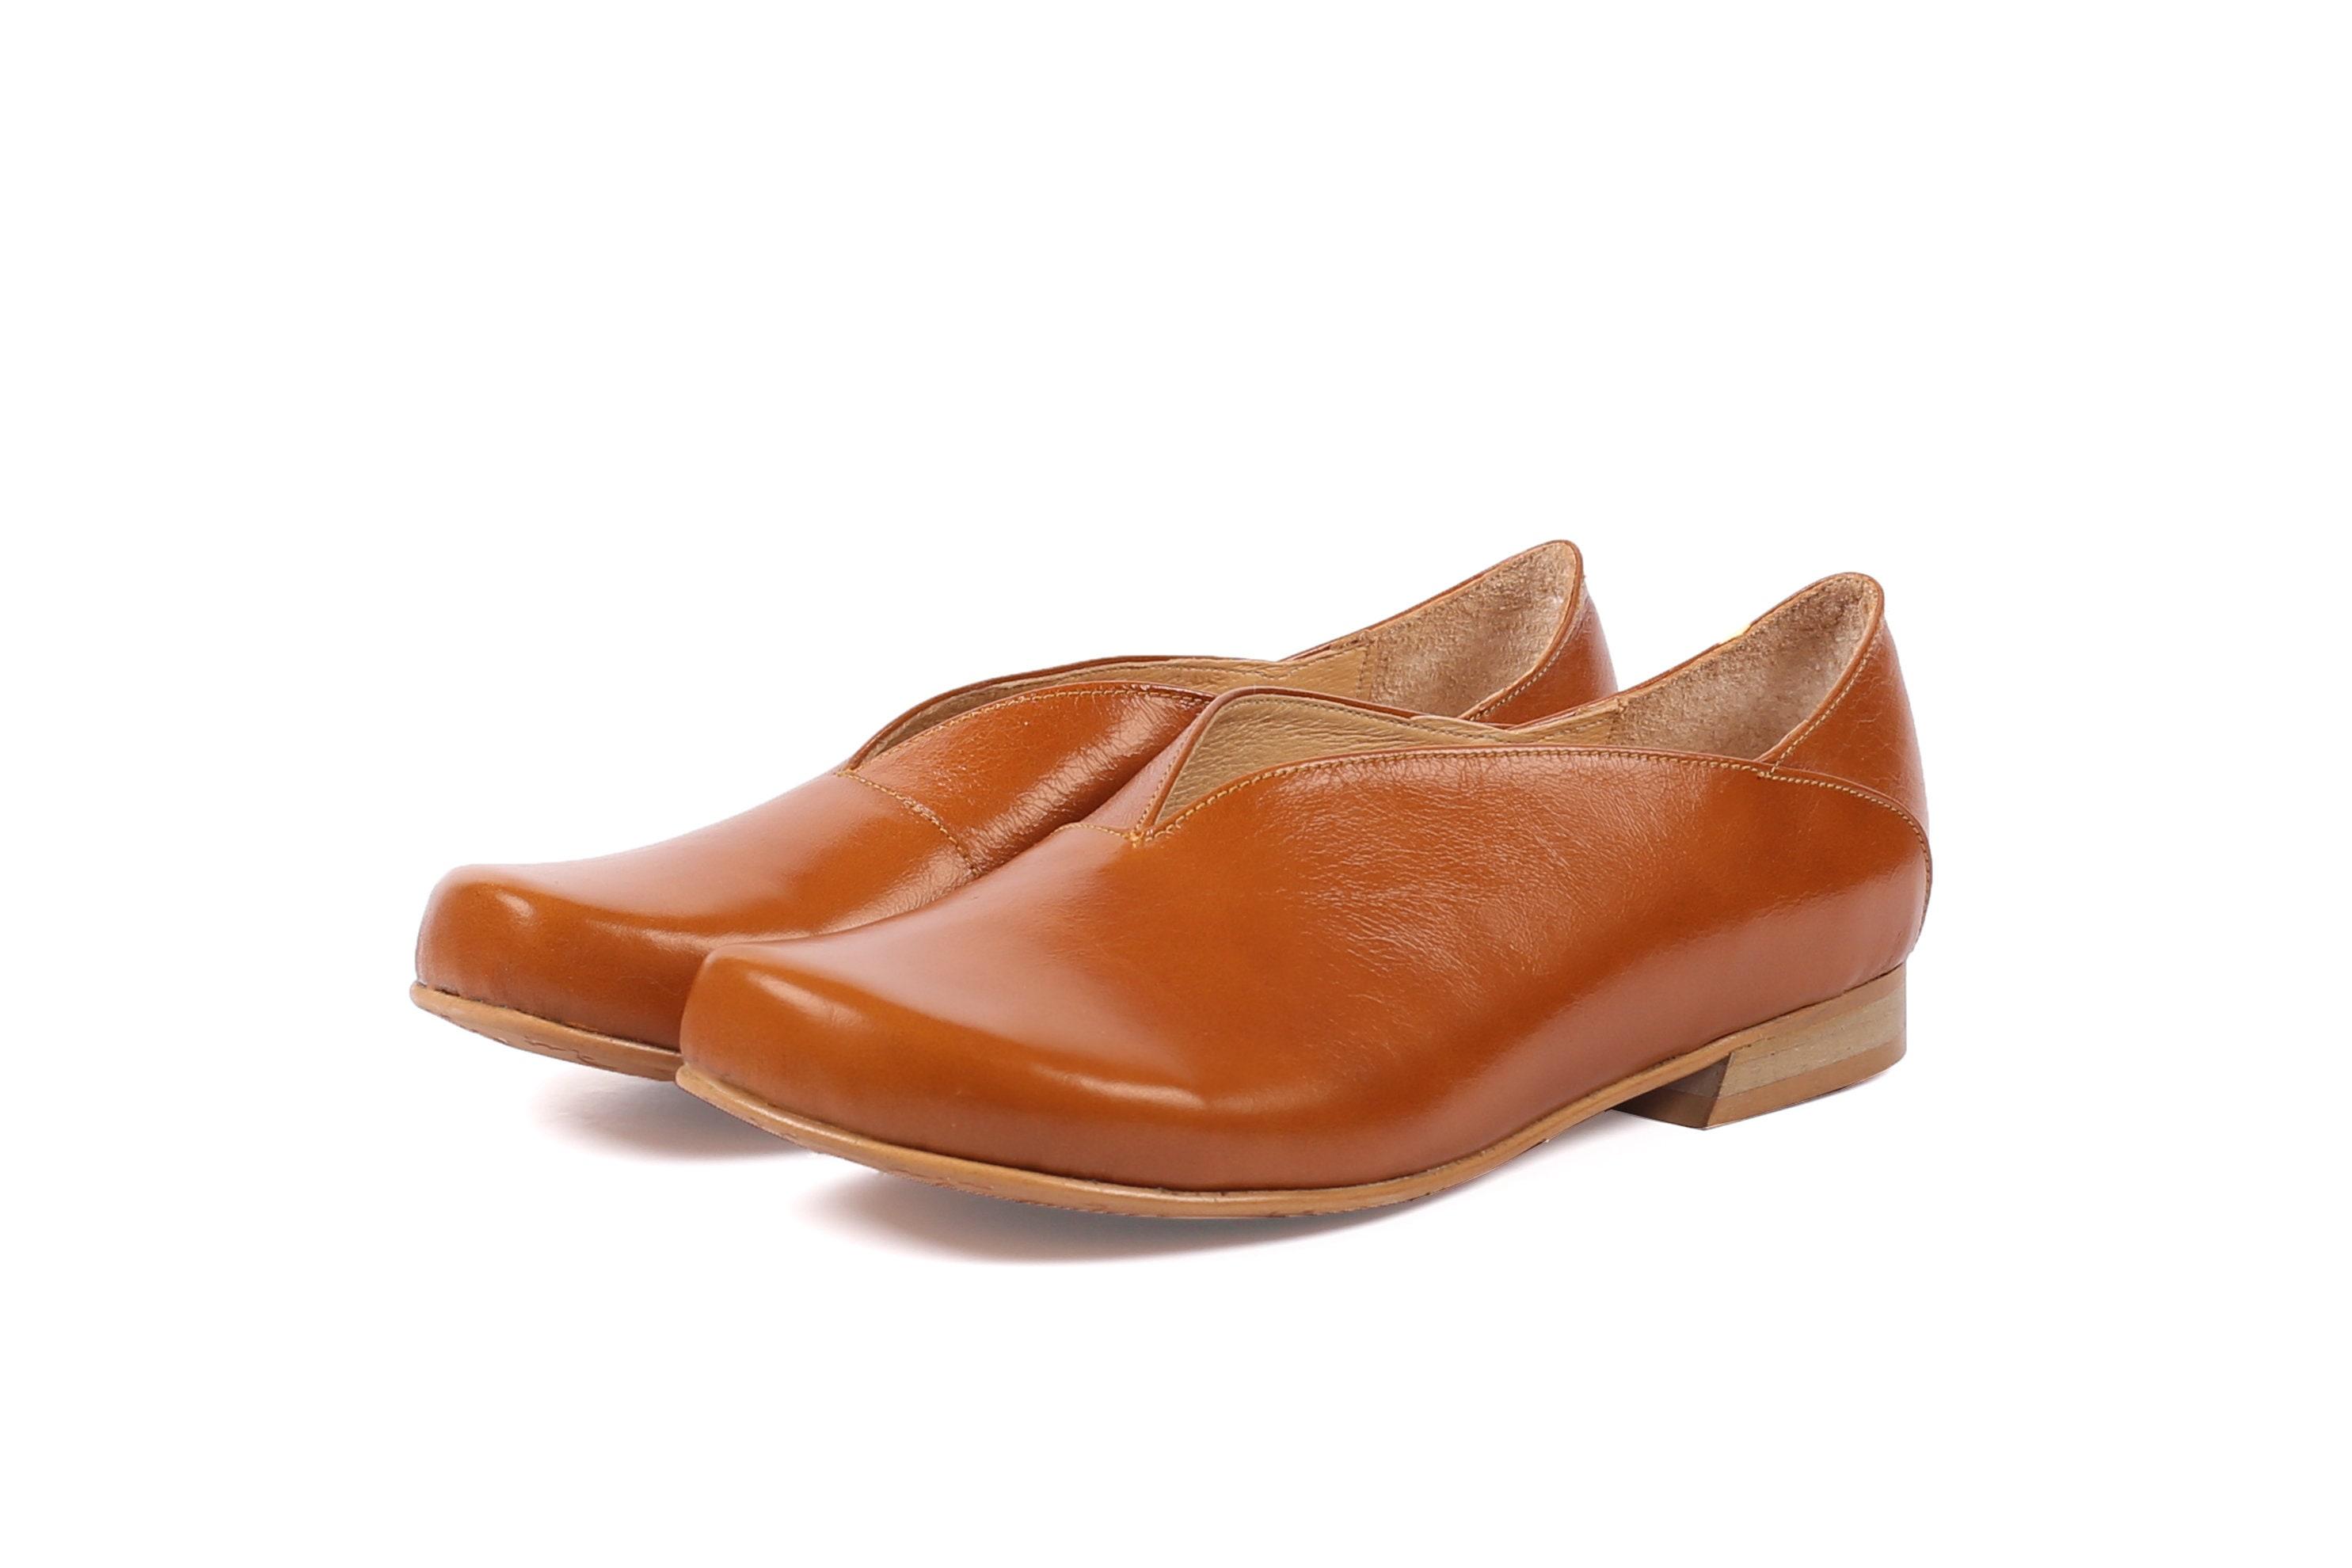 96fbc059afd95 Women's shoes wide flats brown handmade free shipping ADIKILAV